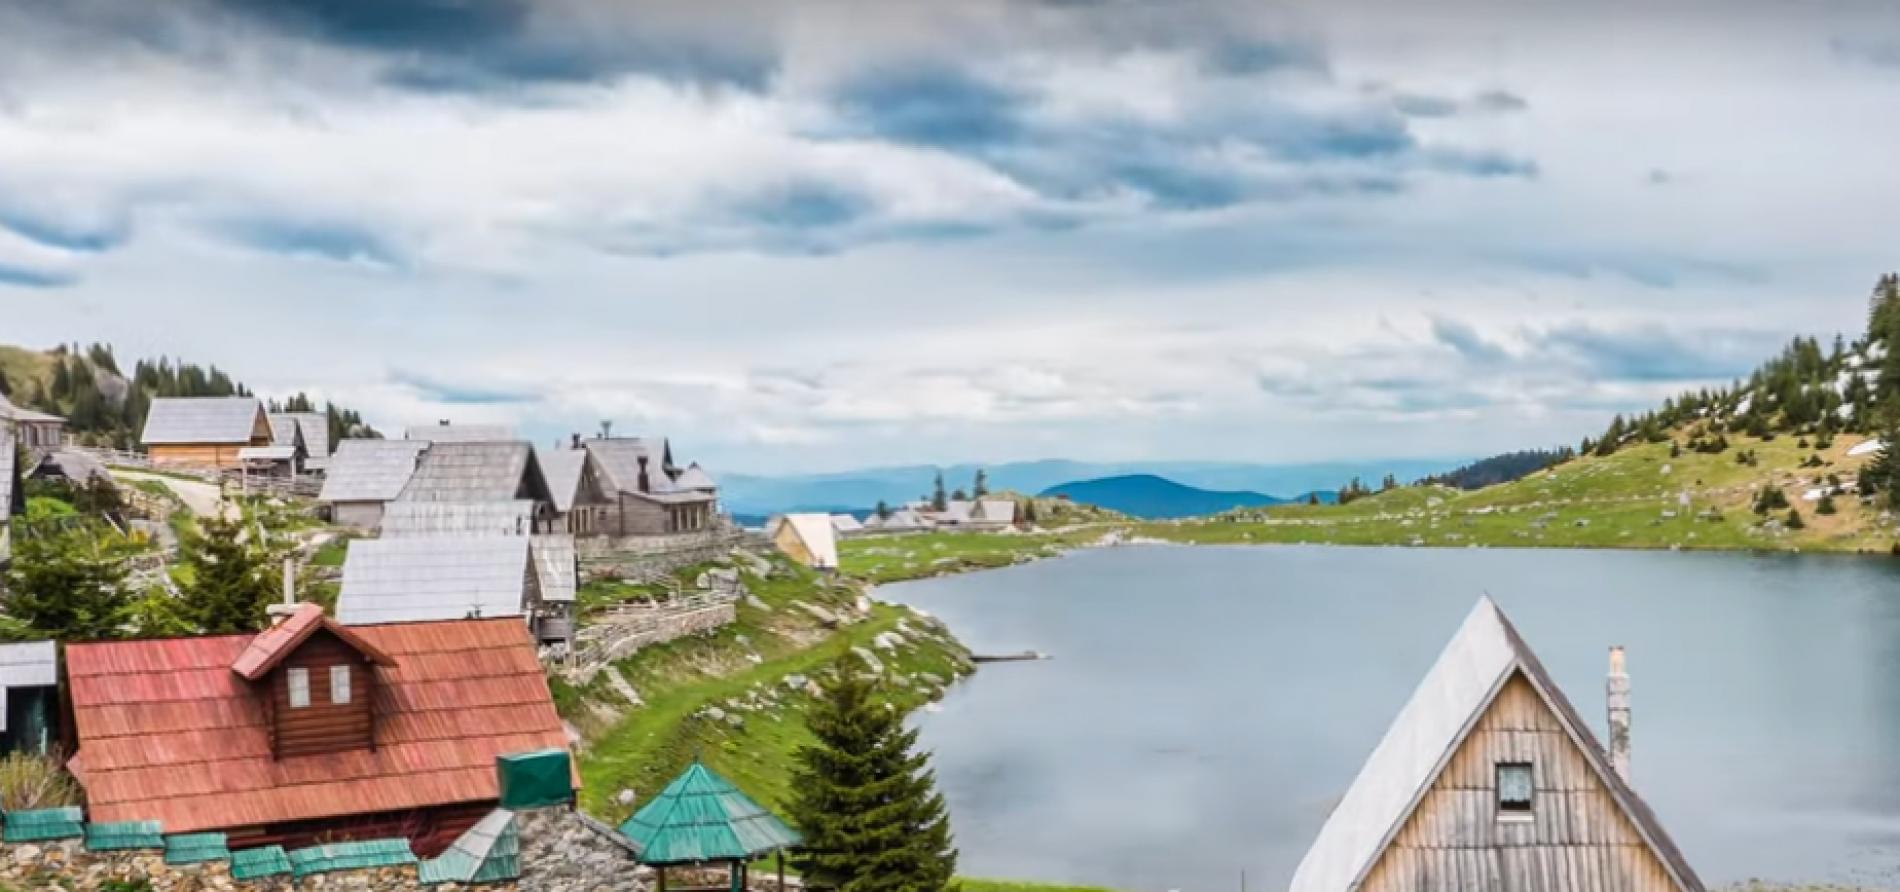 Bosanske ljepote: Prokoško jezero (VIDEO)